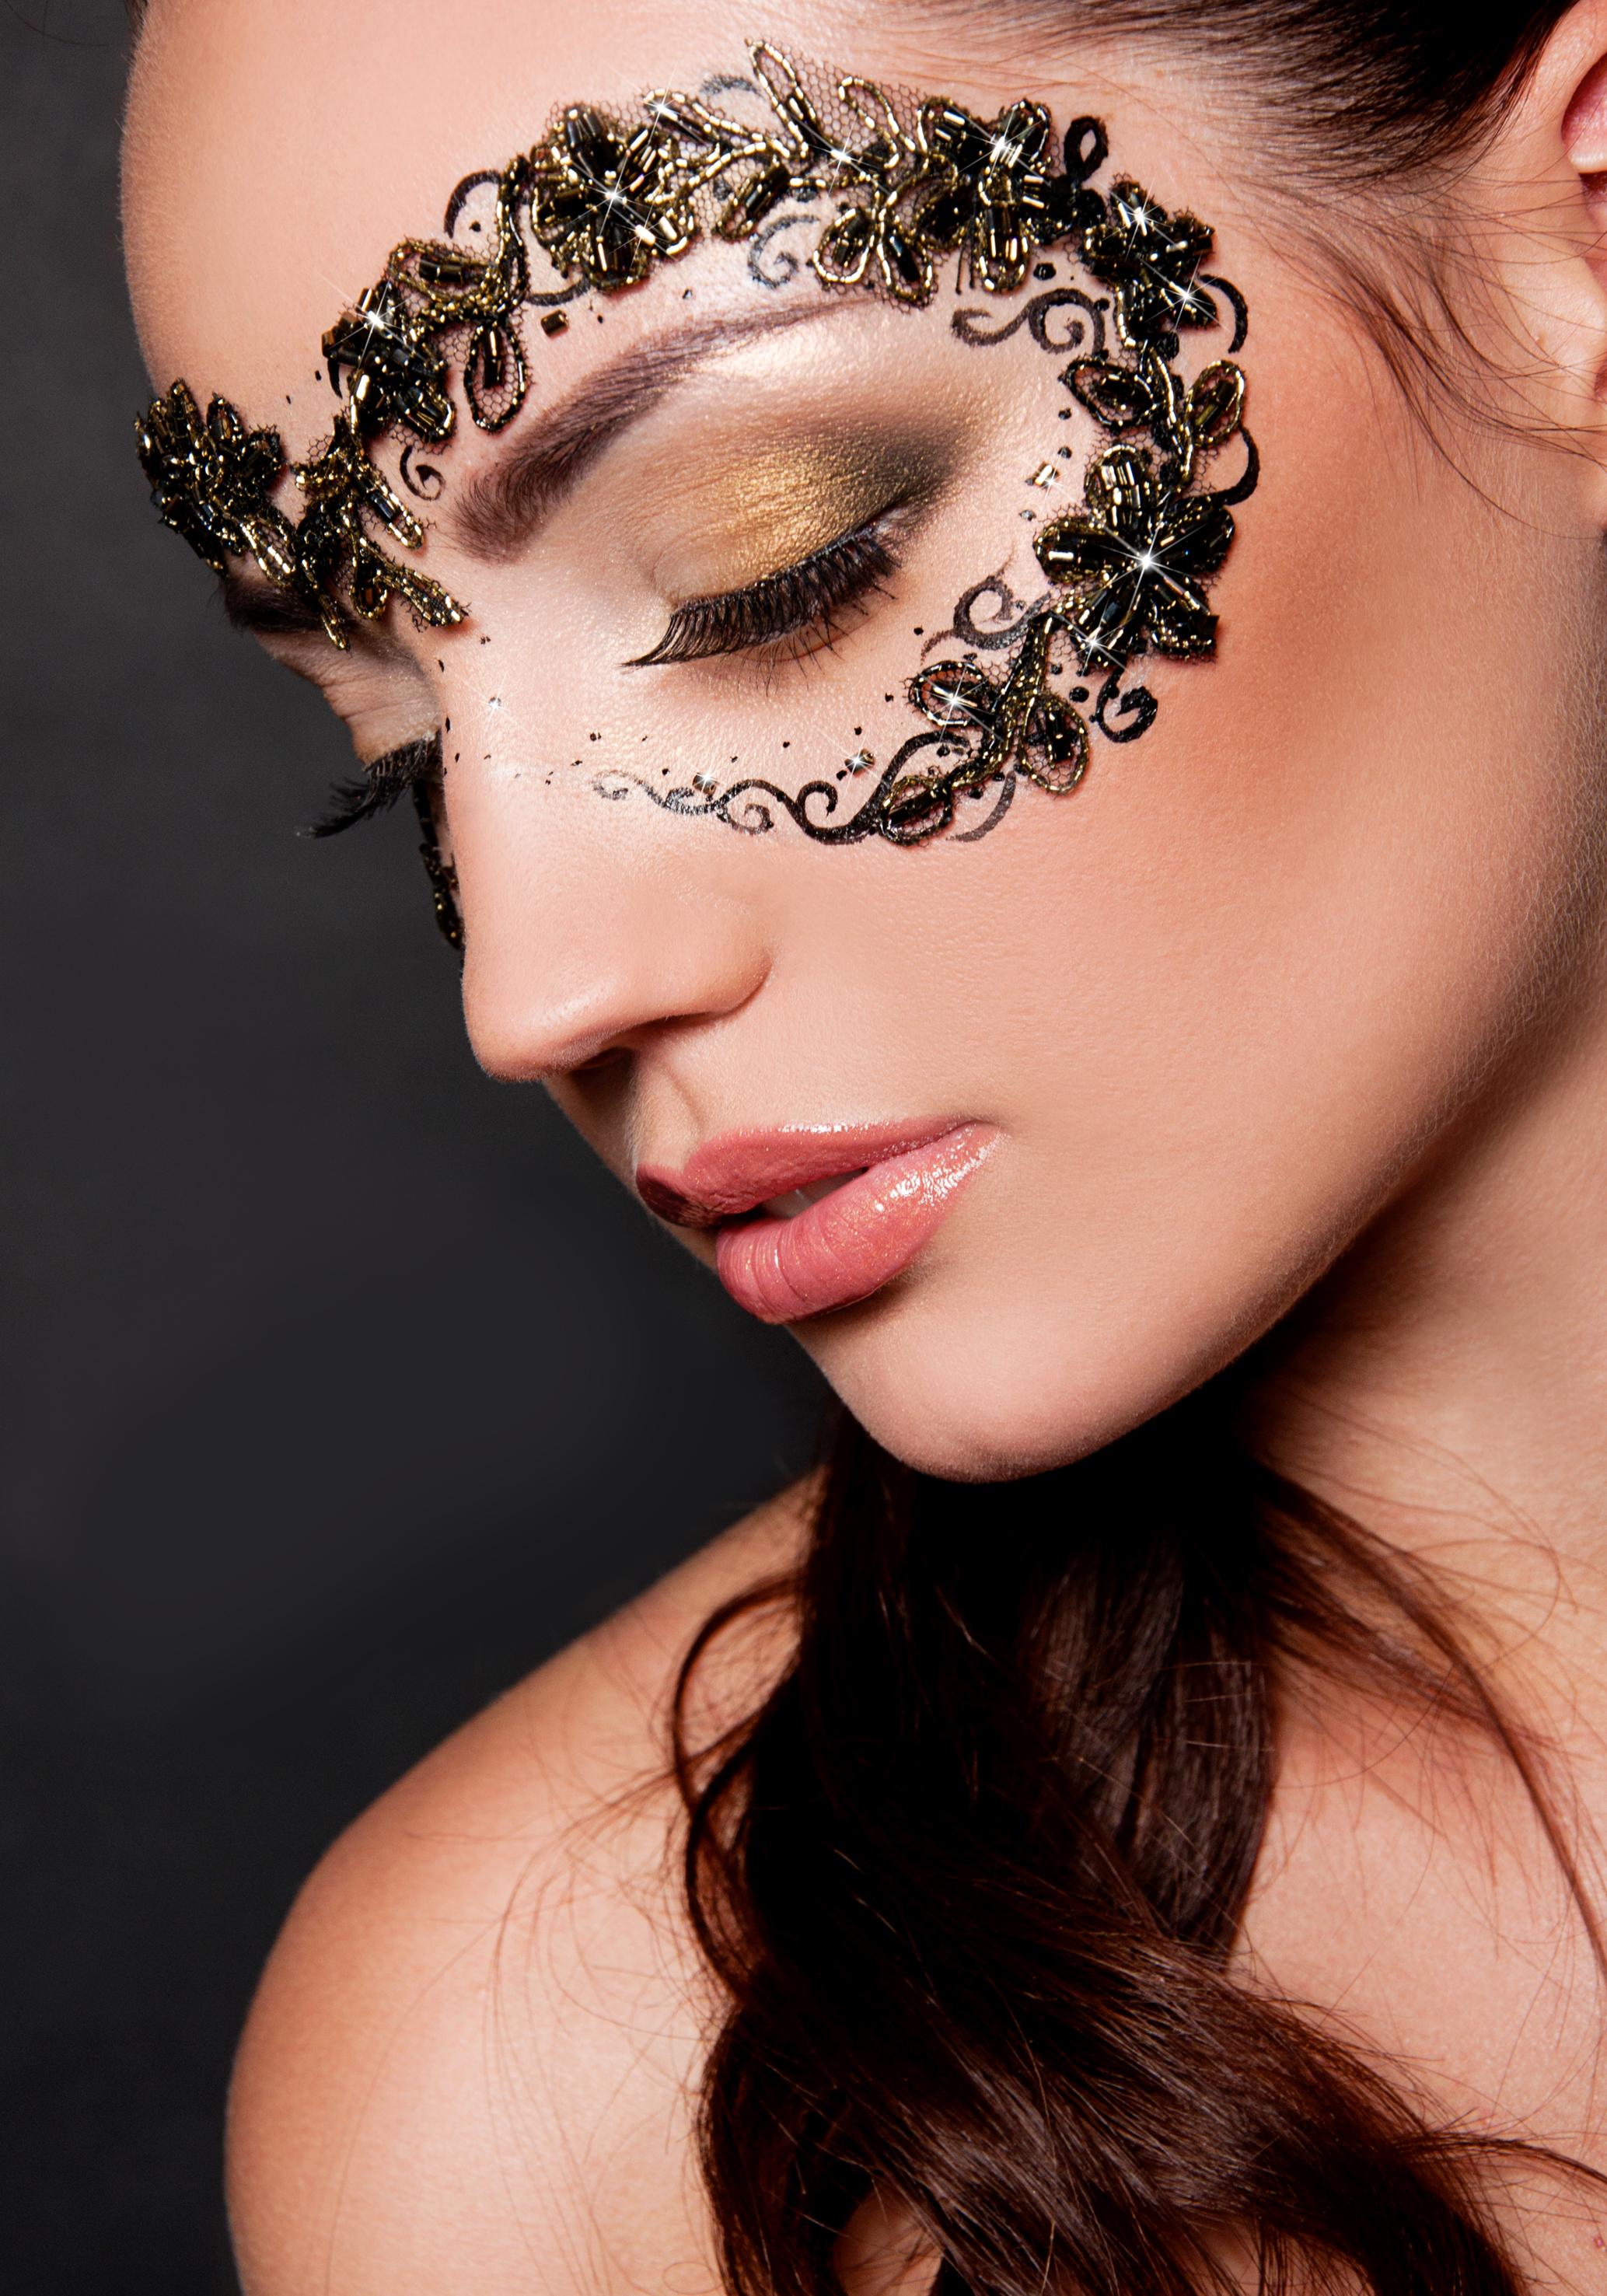 Стиль арт макияж фото